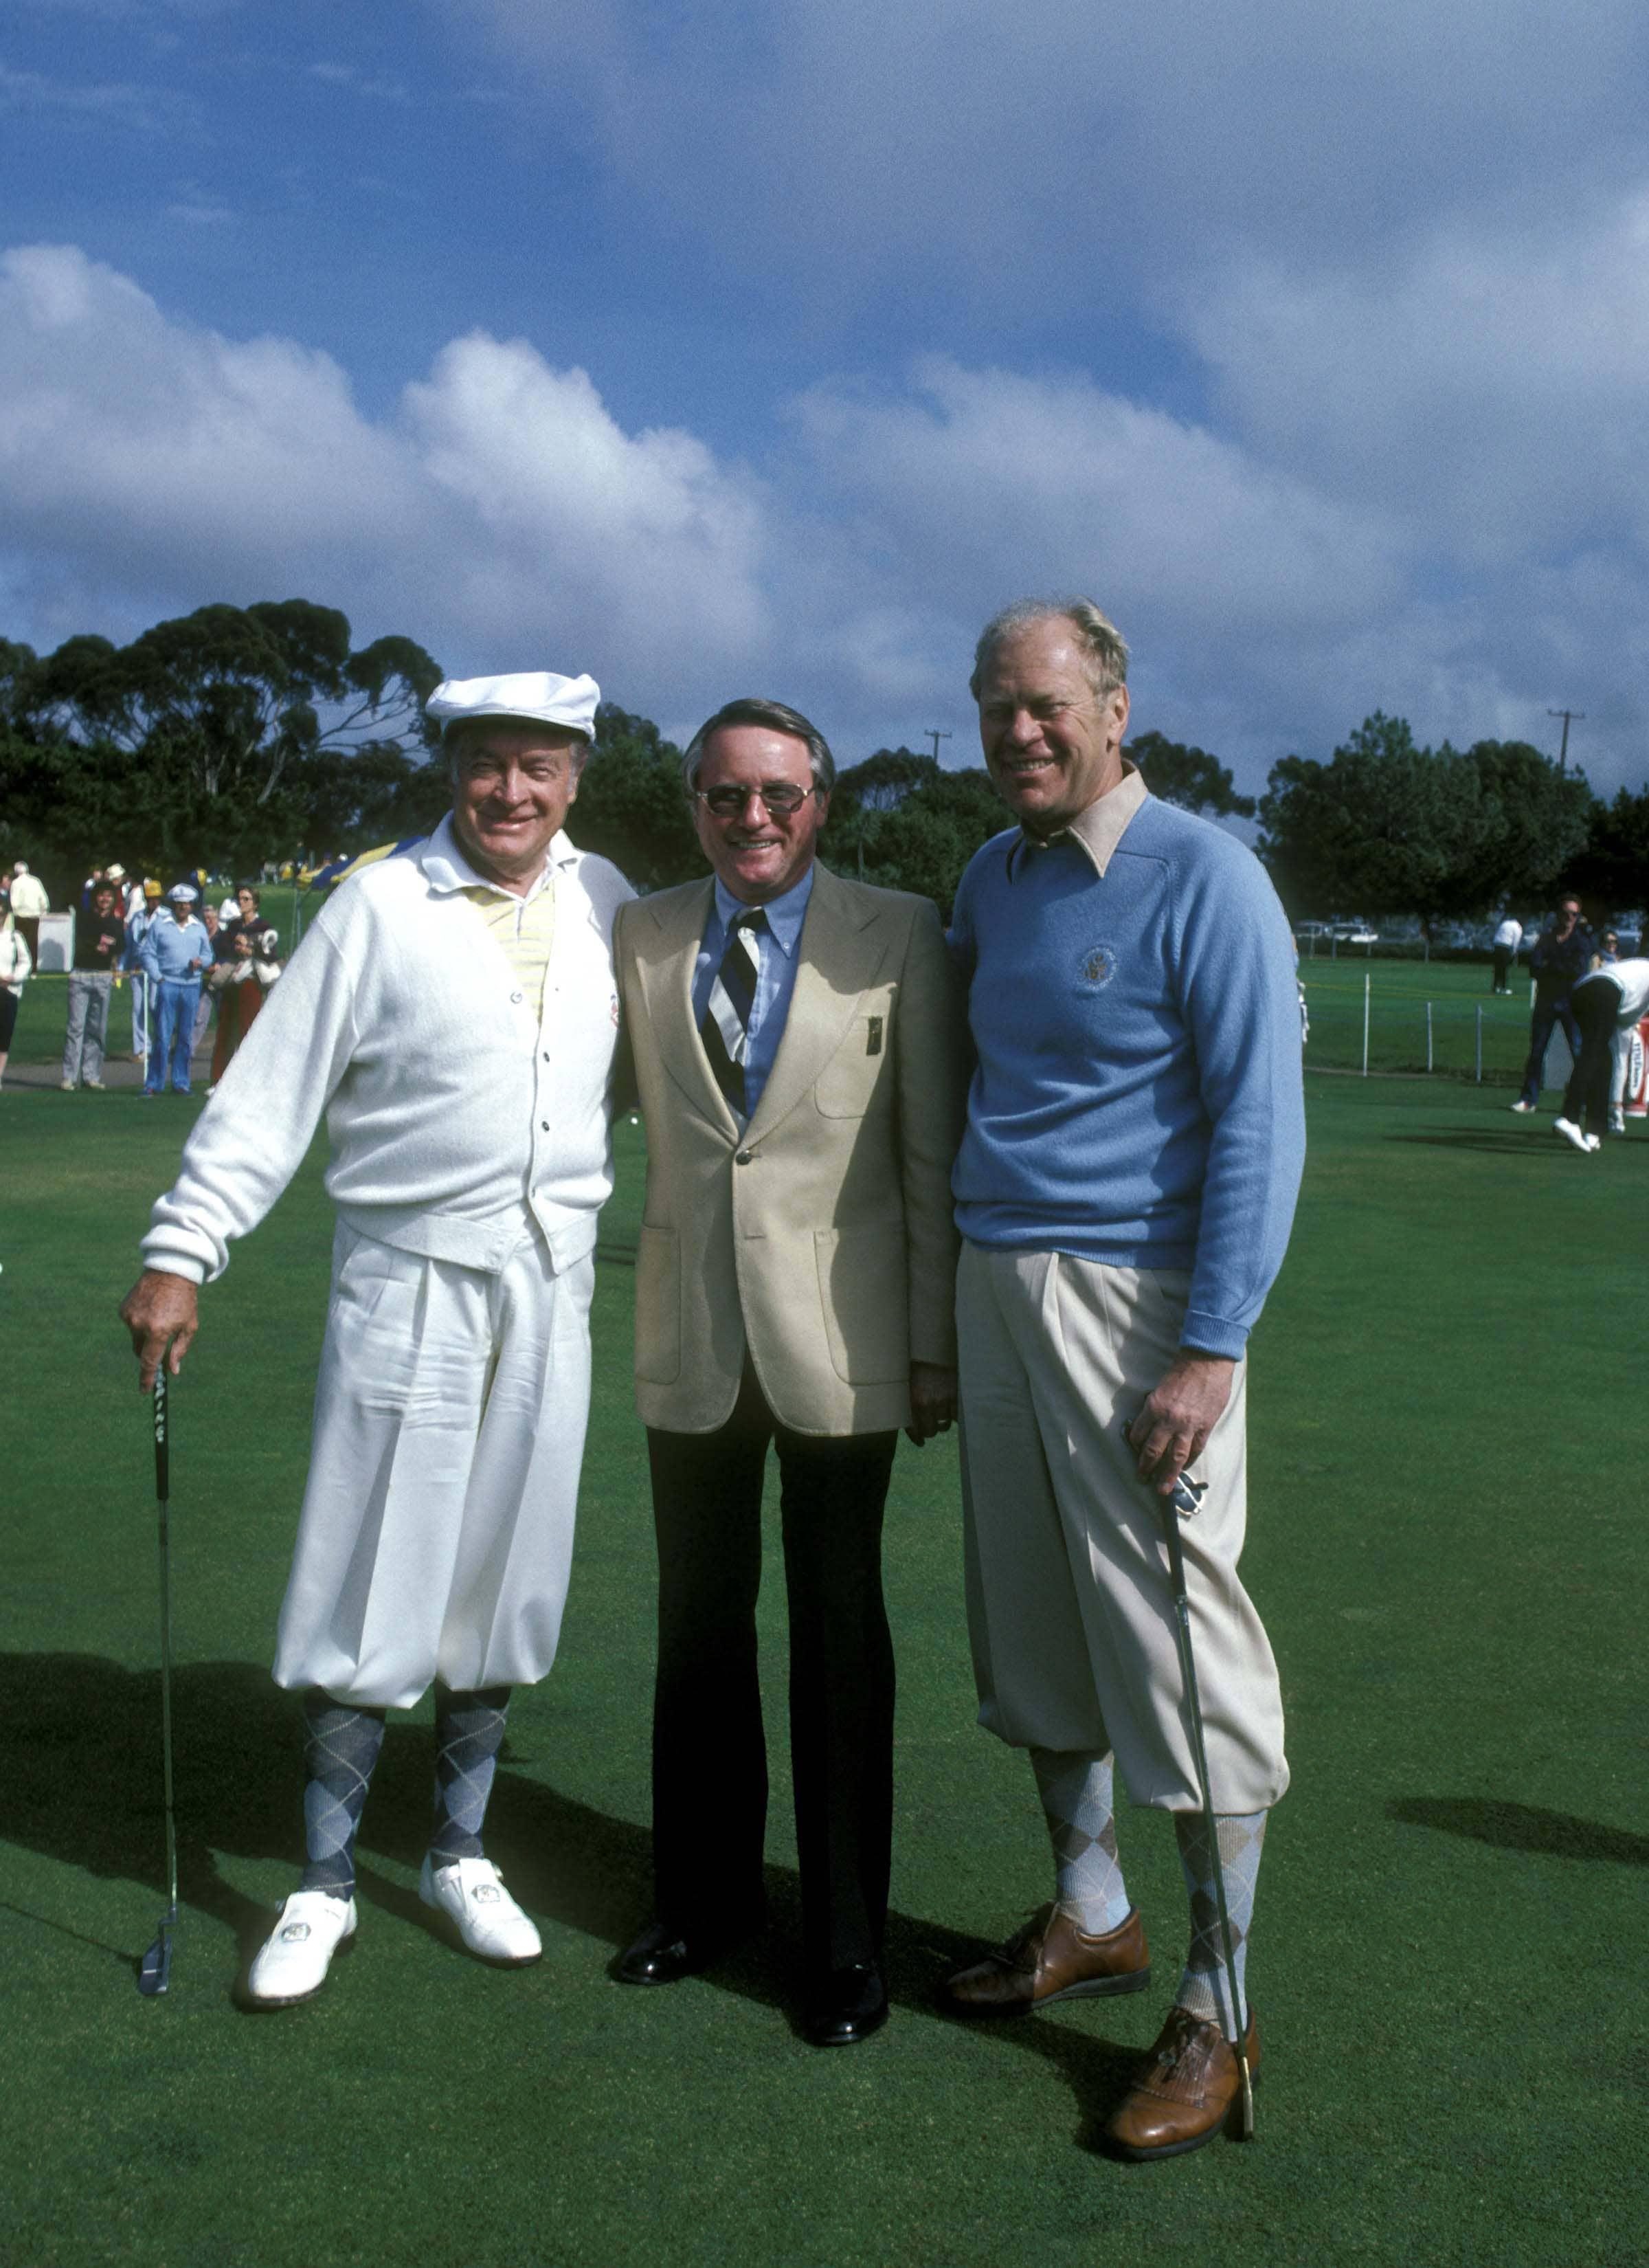 Bob Hope, Deane Beman and Gerald Ford